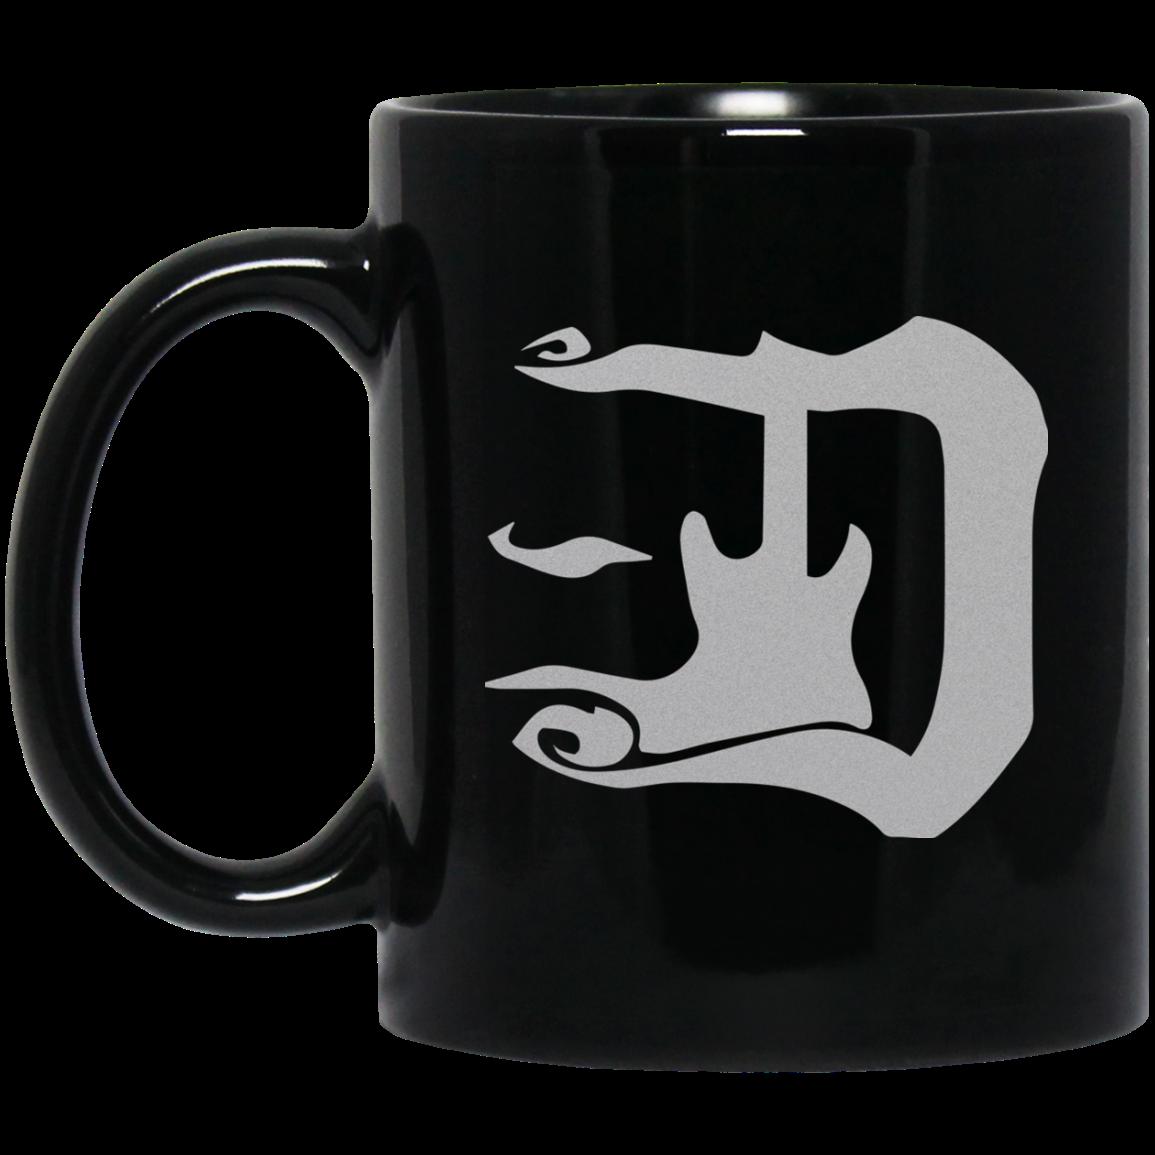 guitar d silver logo 11 oz black mug welcome to the d